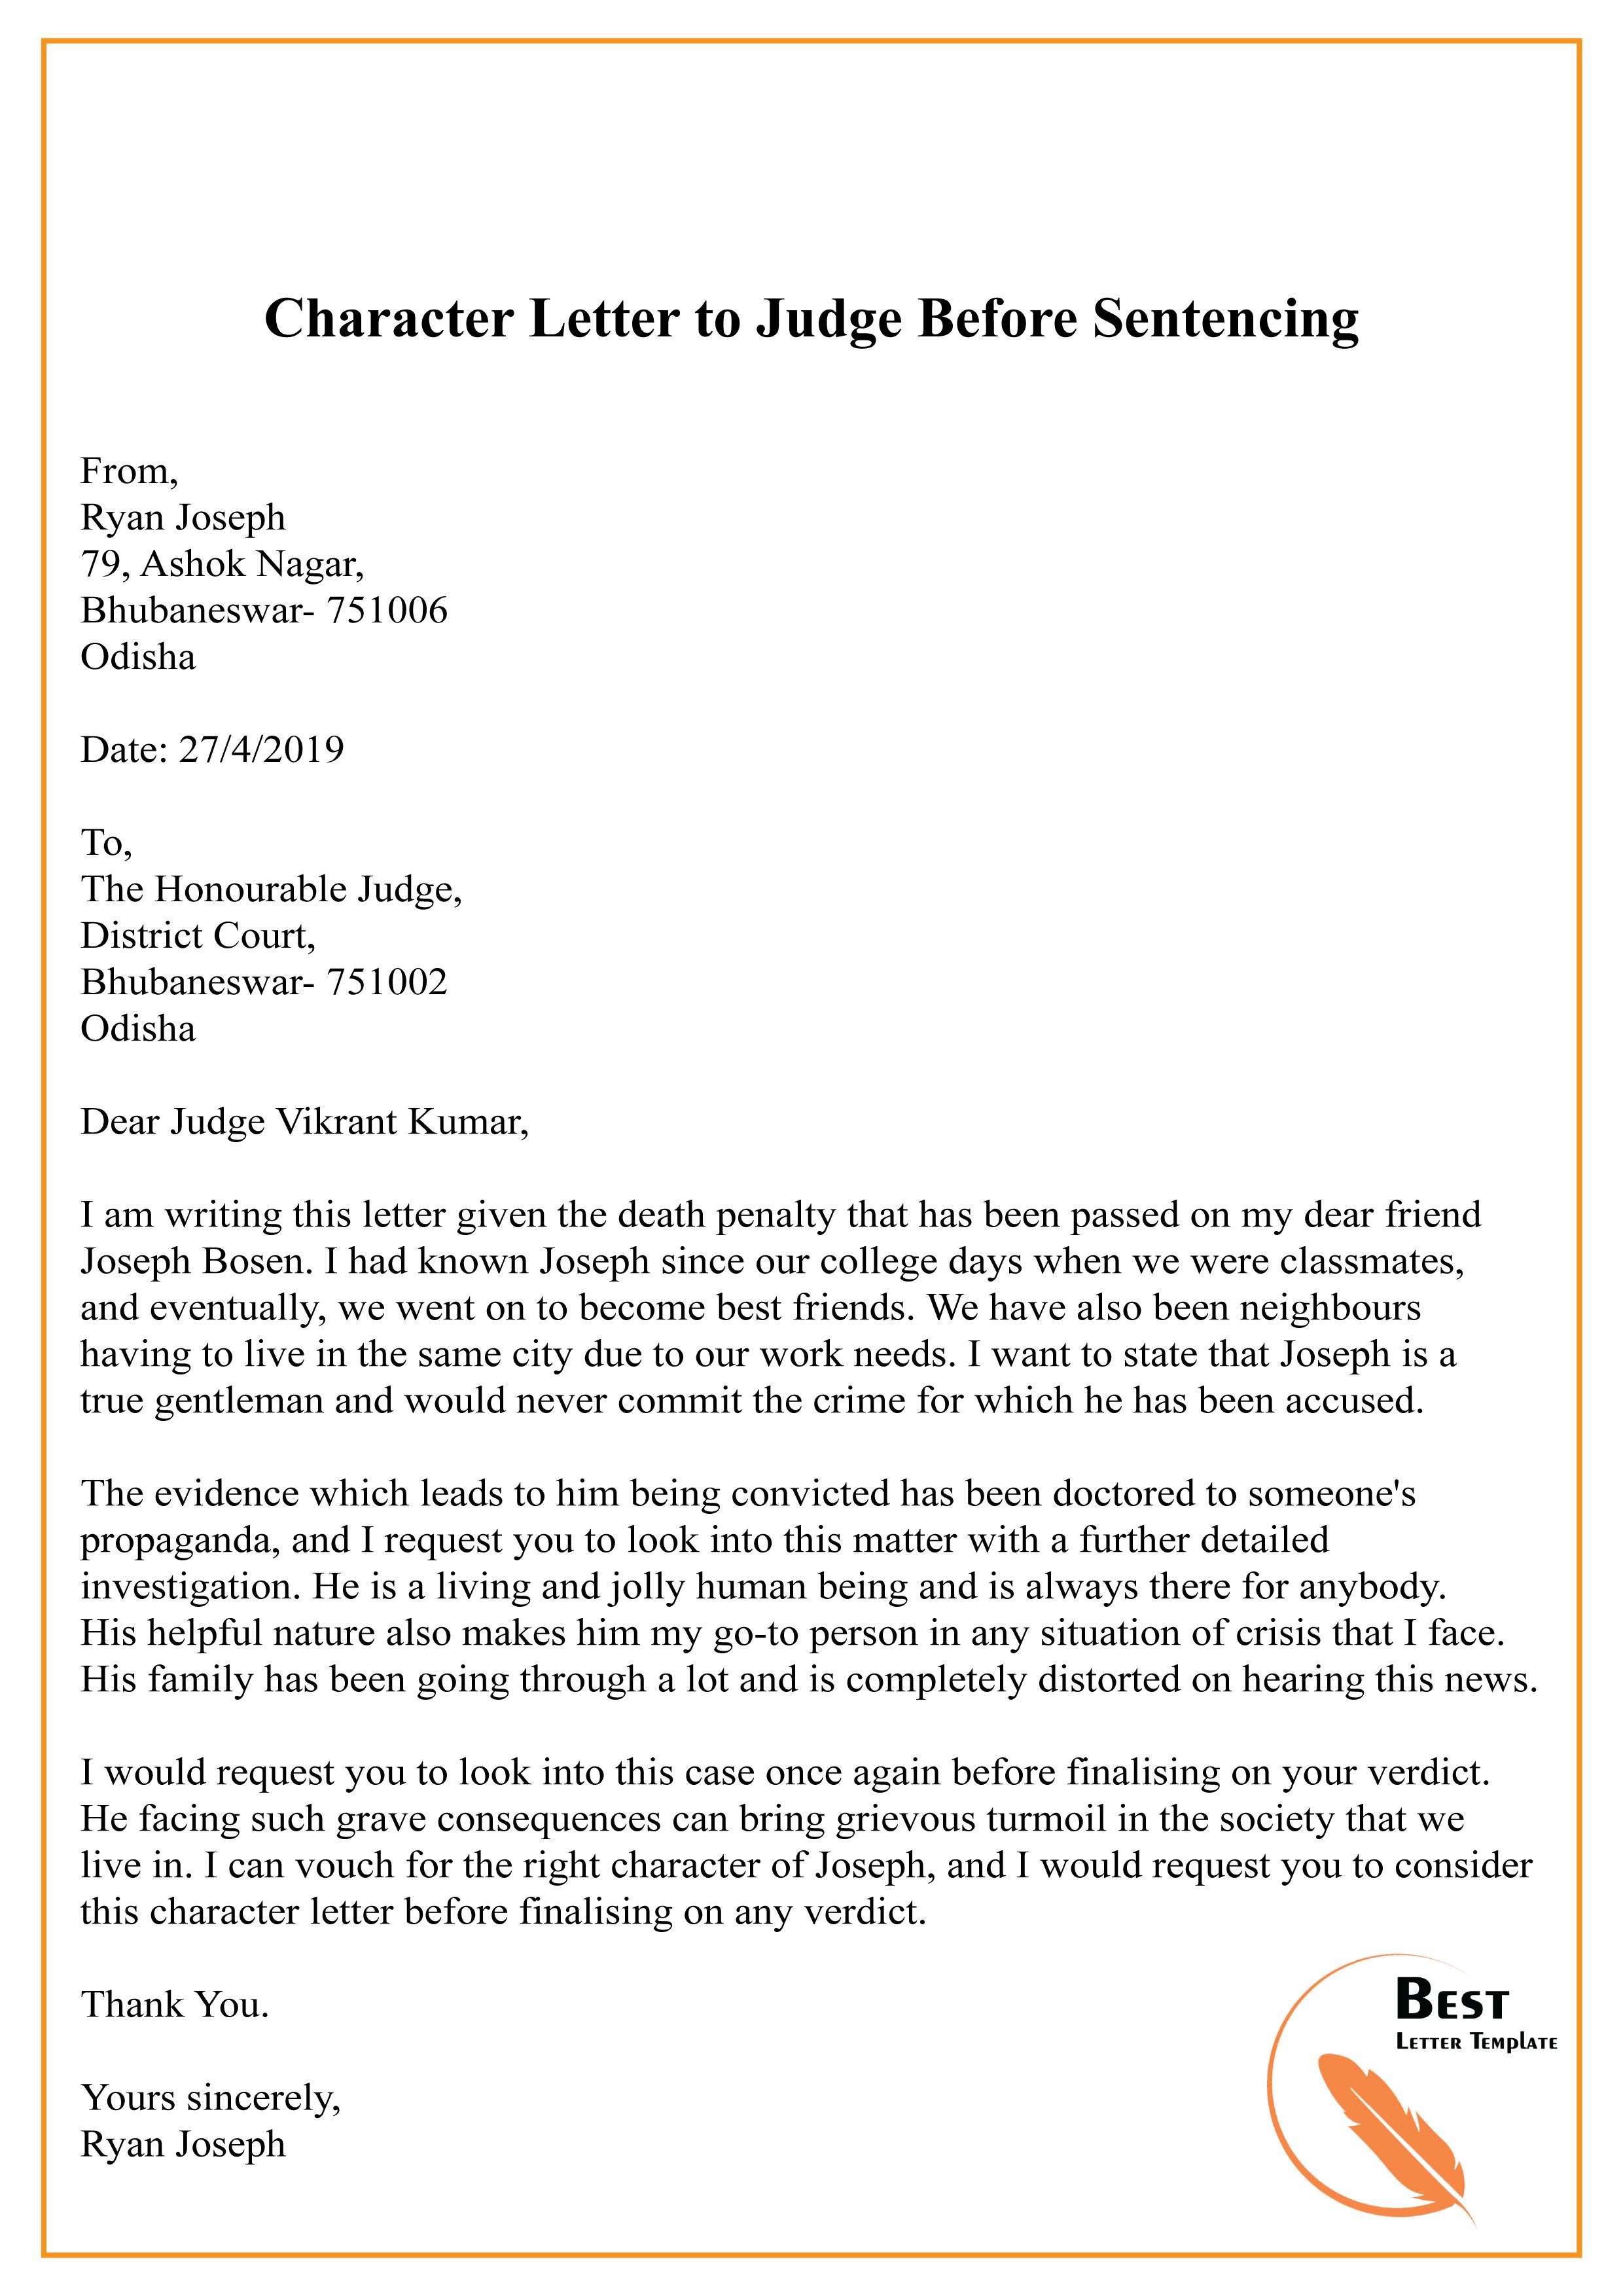 Sample Letter To Judge from bestlettertemplate.com